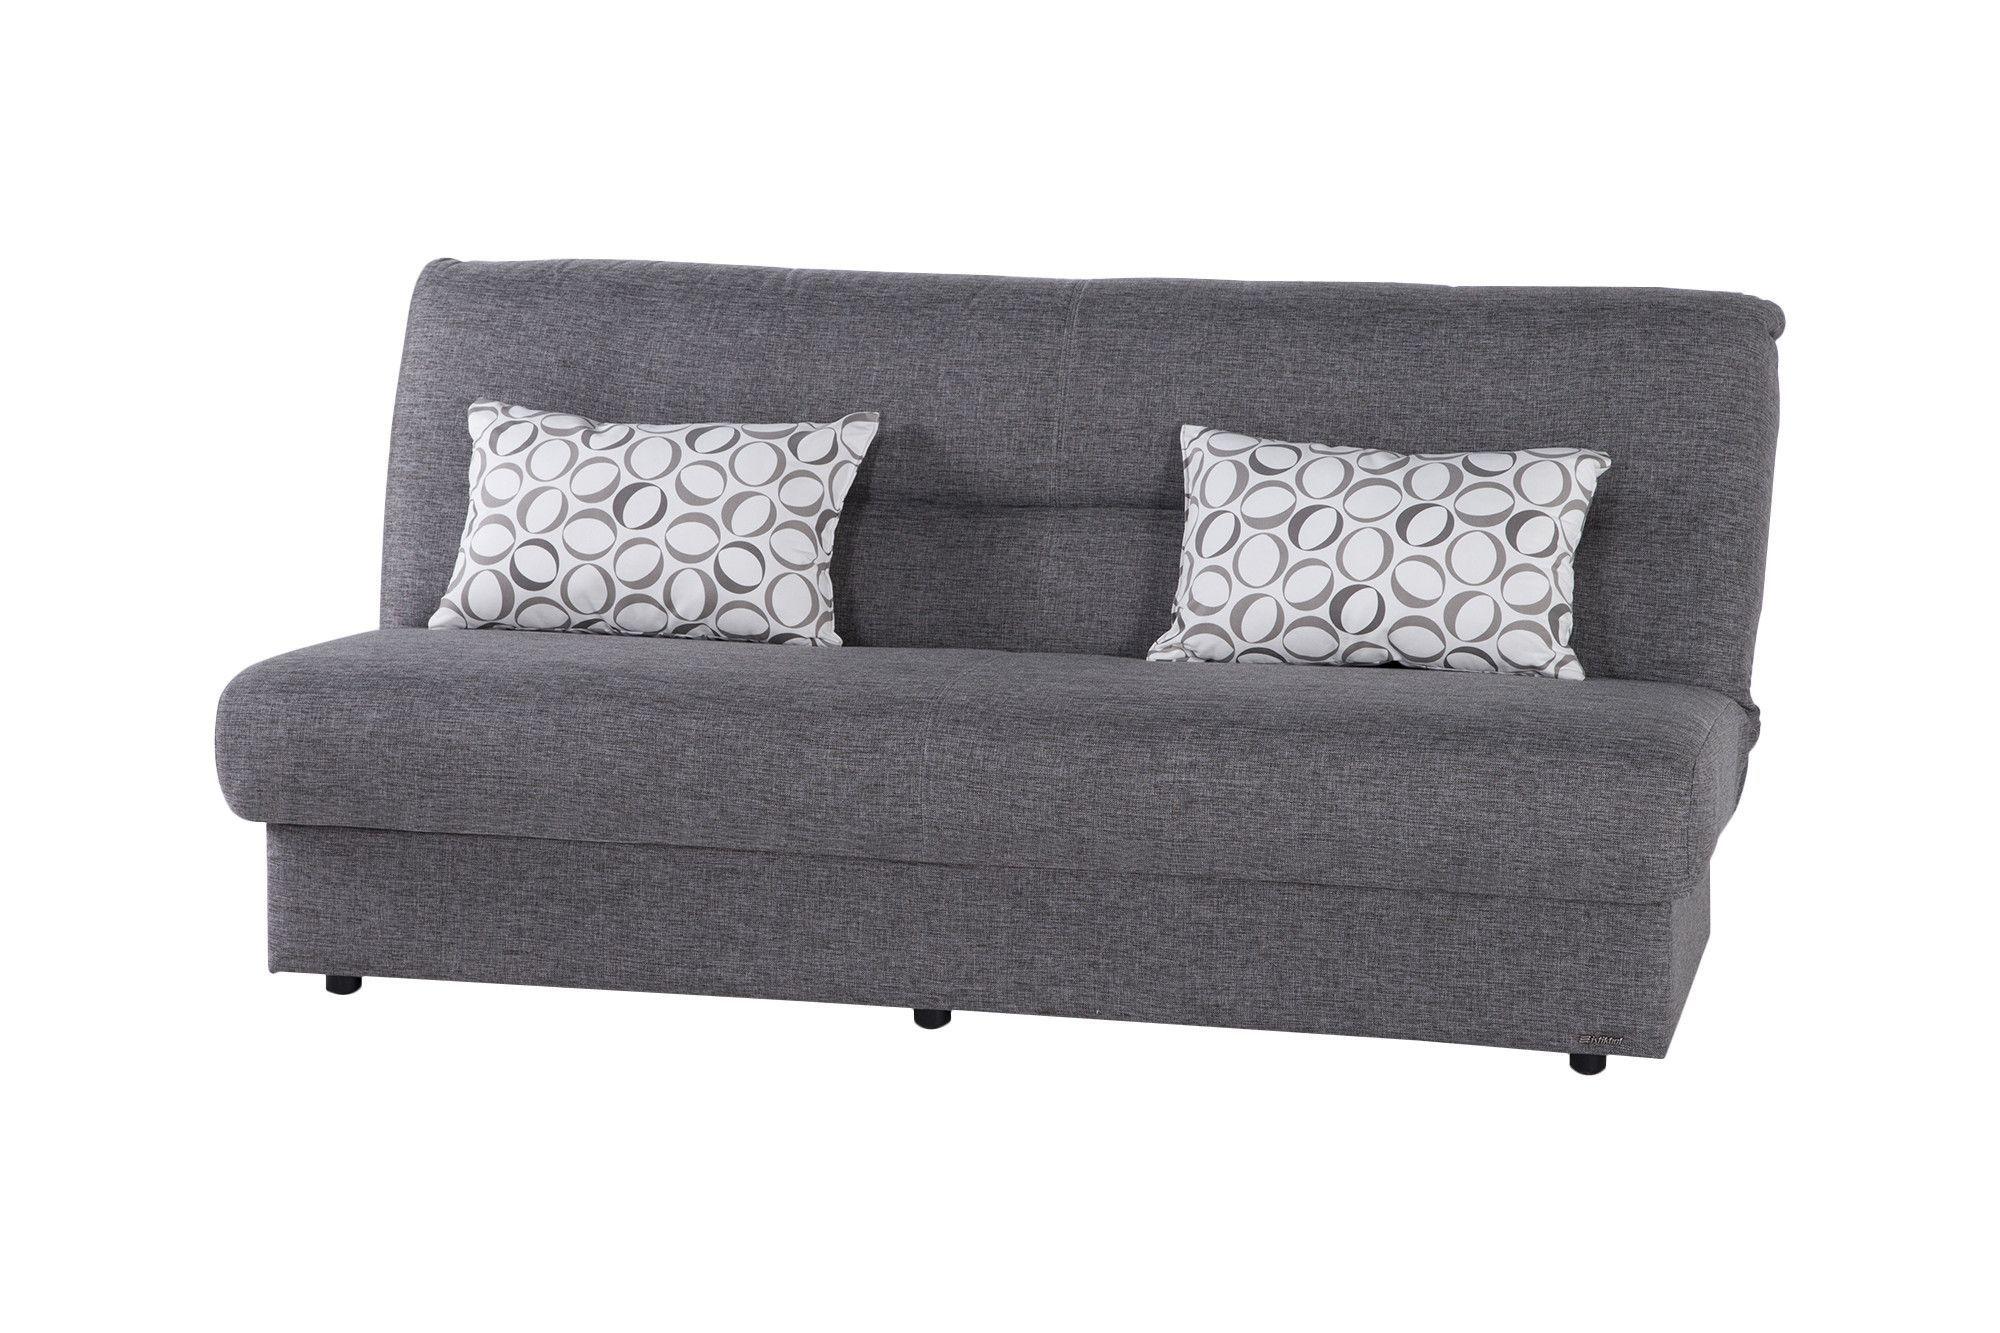 Regata seat convertible sofa products